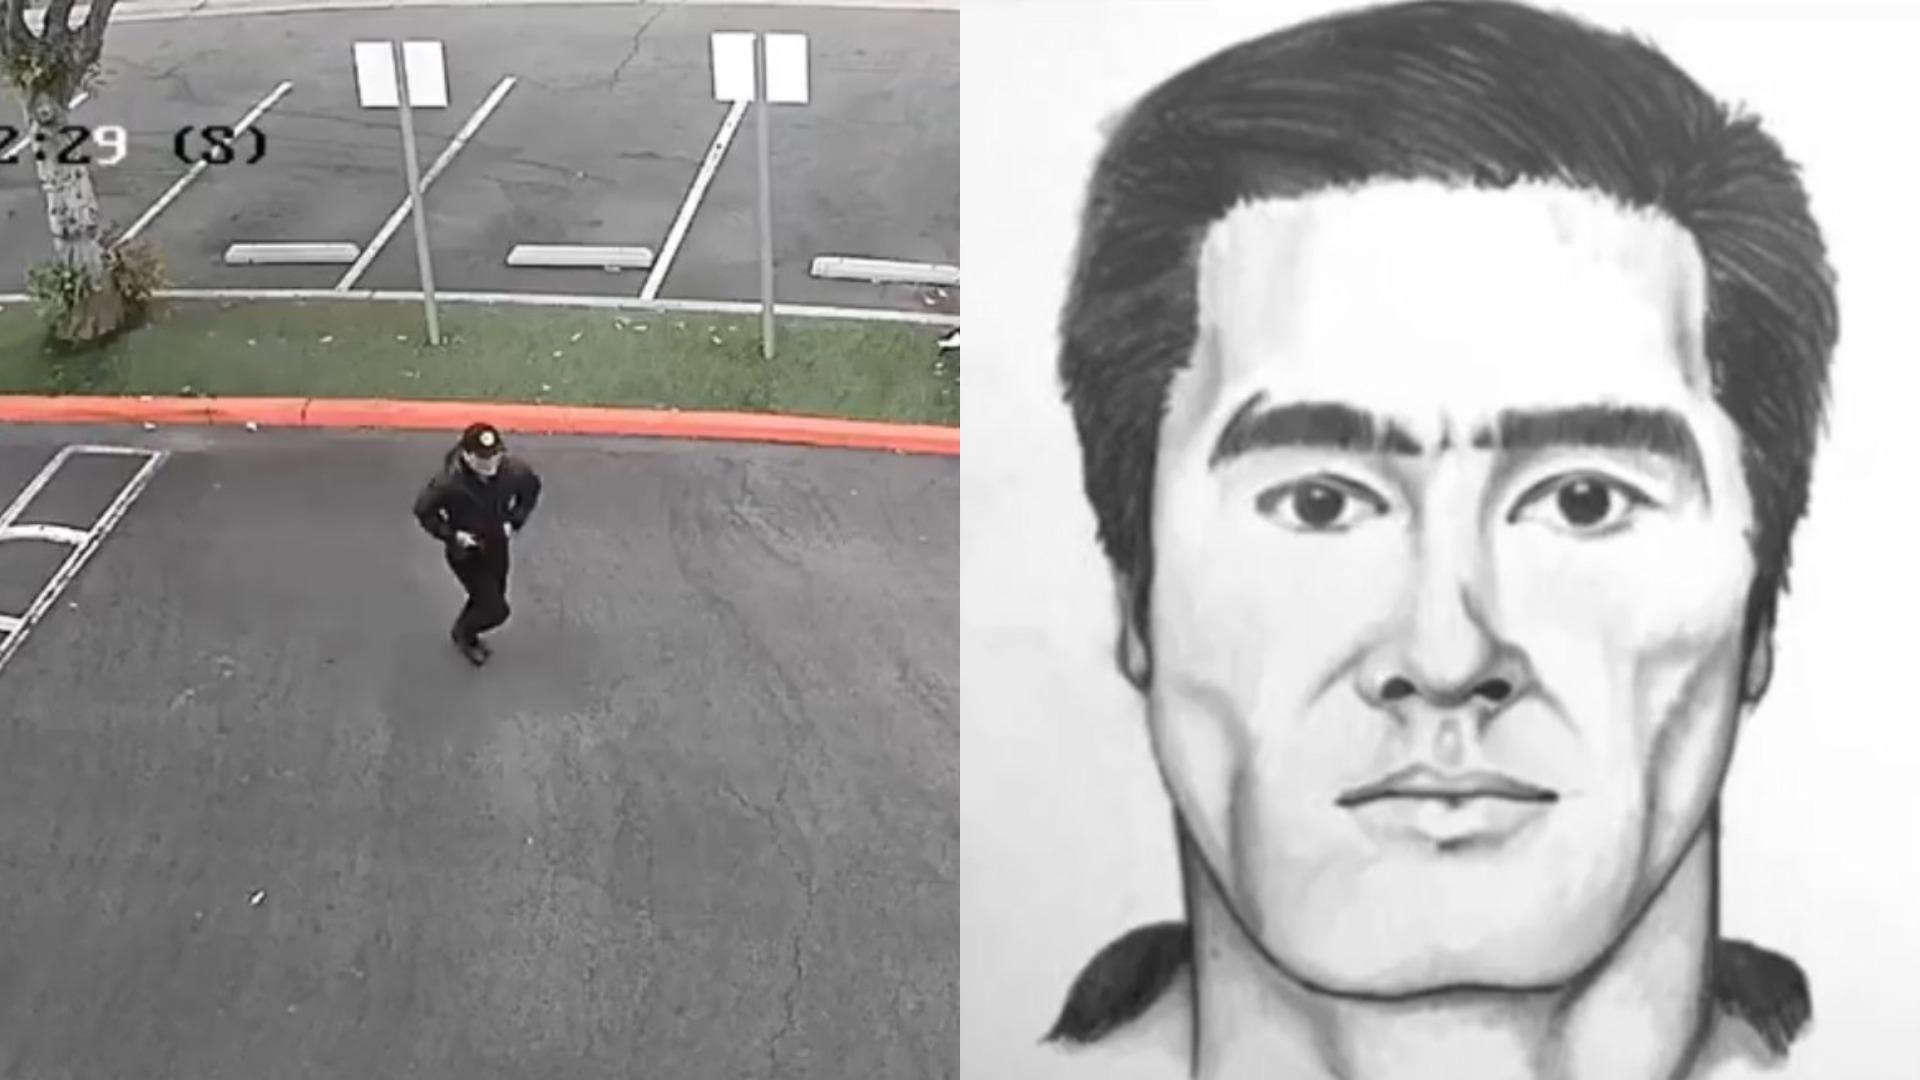 Video sketch released of suspect in CSUF stabbing death Orange 1920x1080